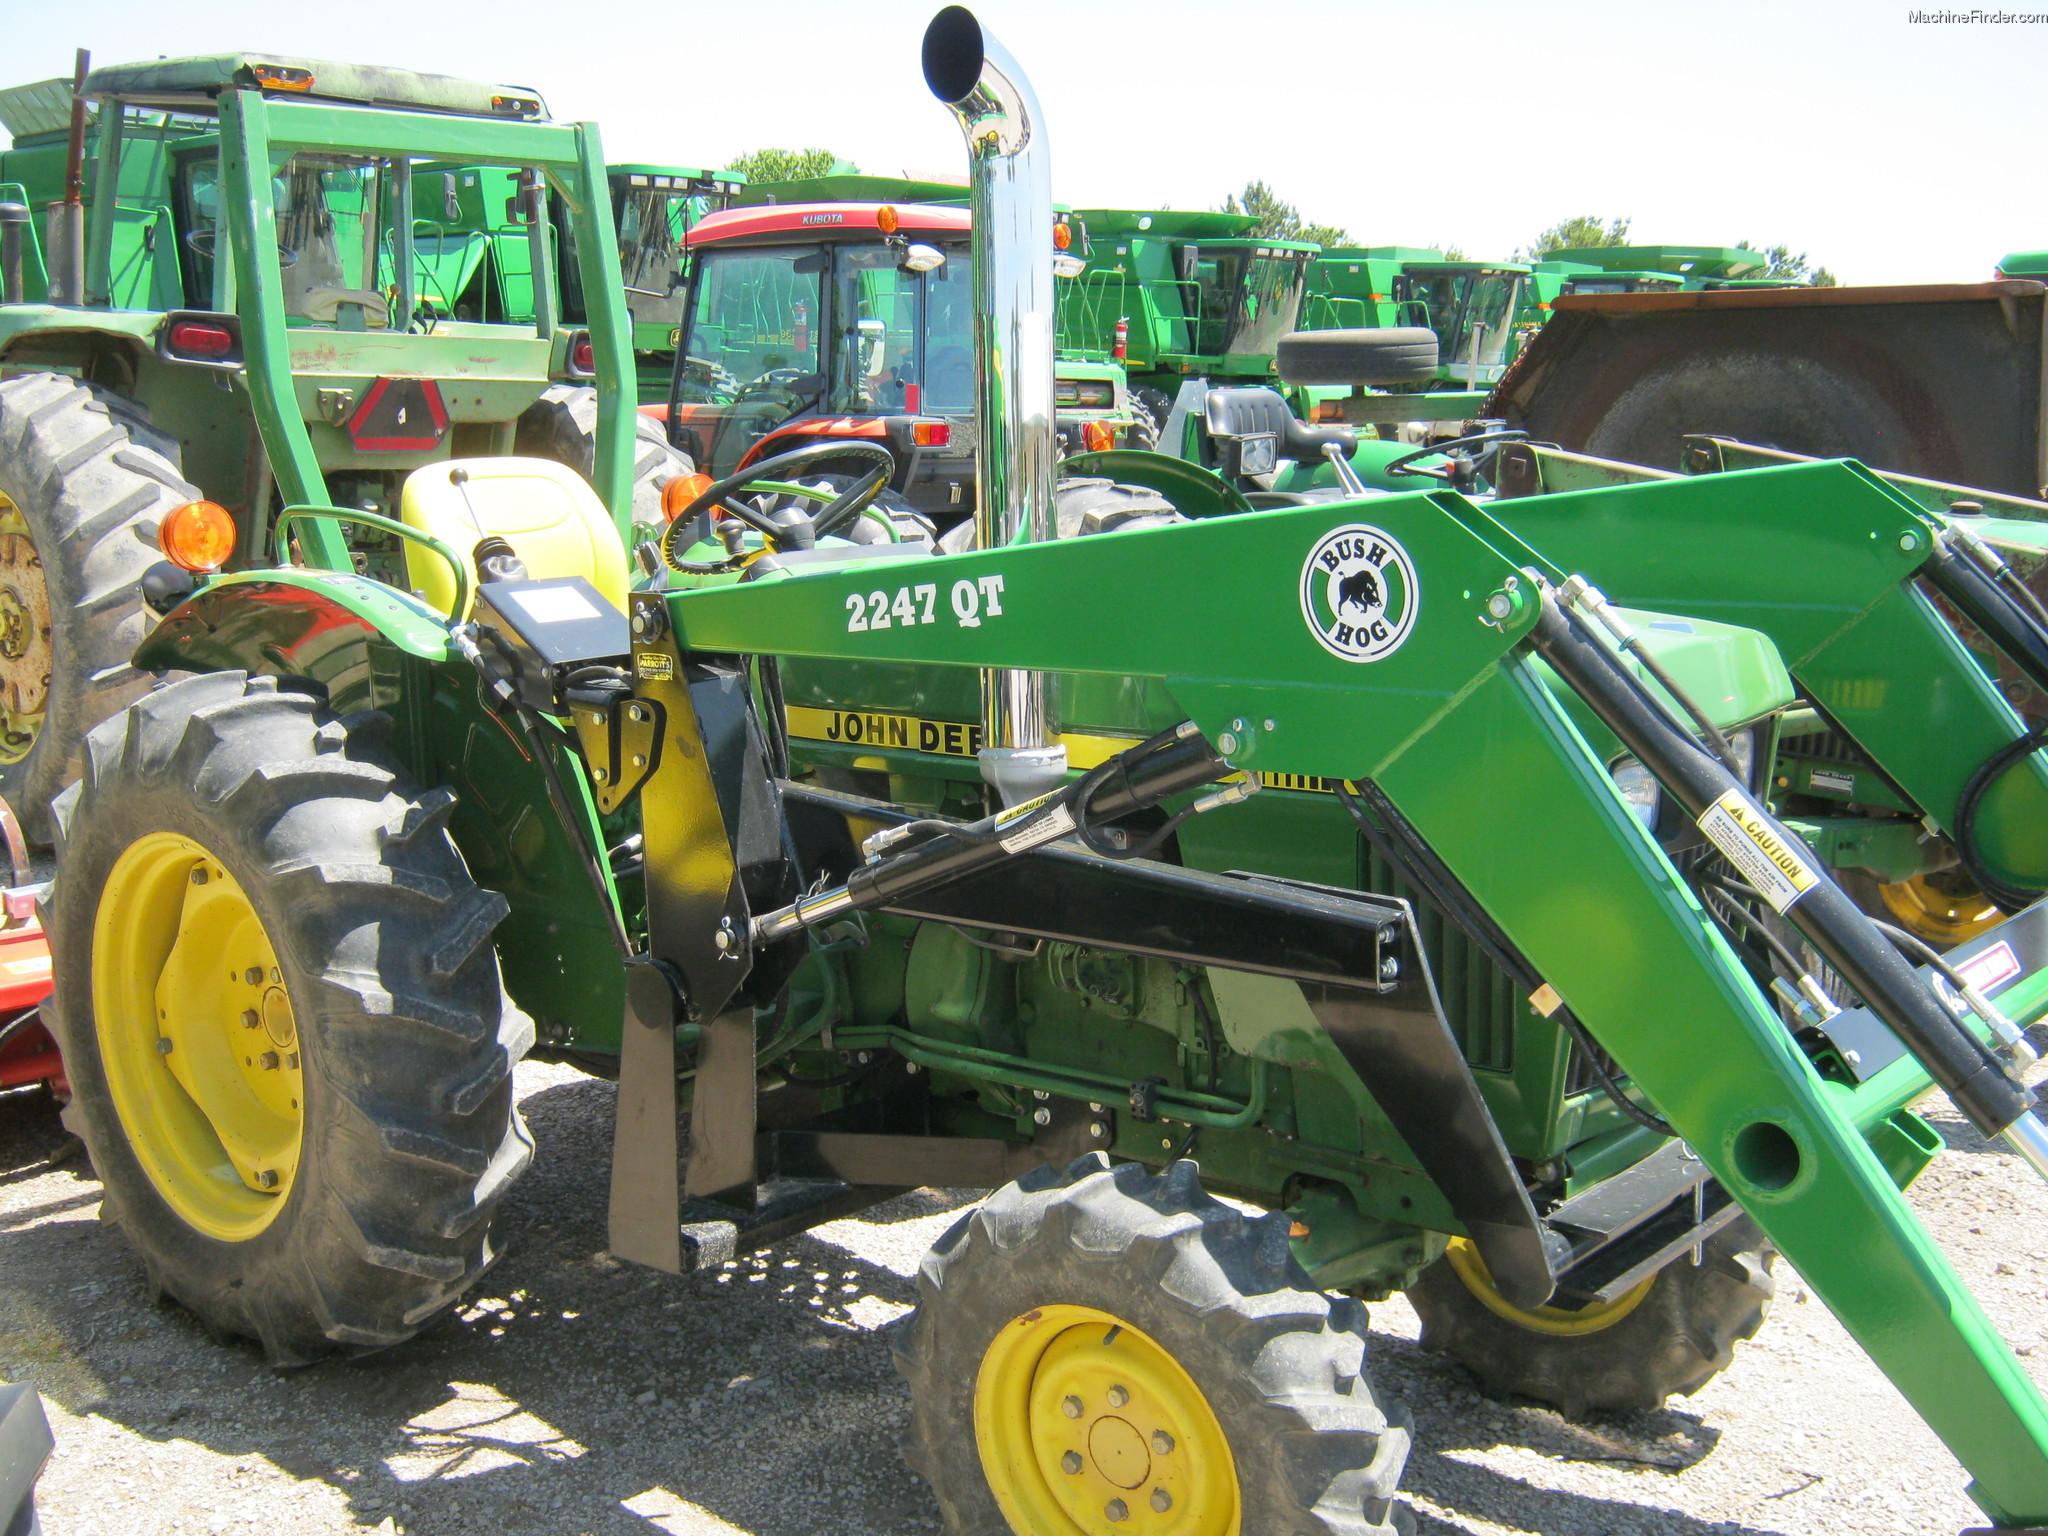 1986 John Deere 850 Tractors - Compact (1-40hp.) - John ...